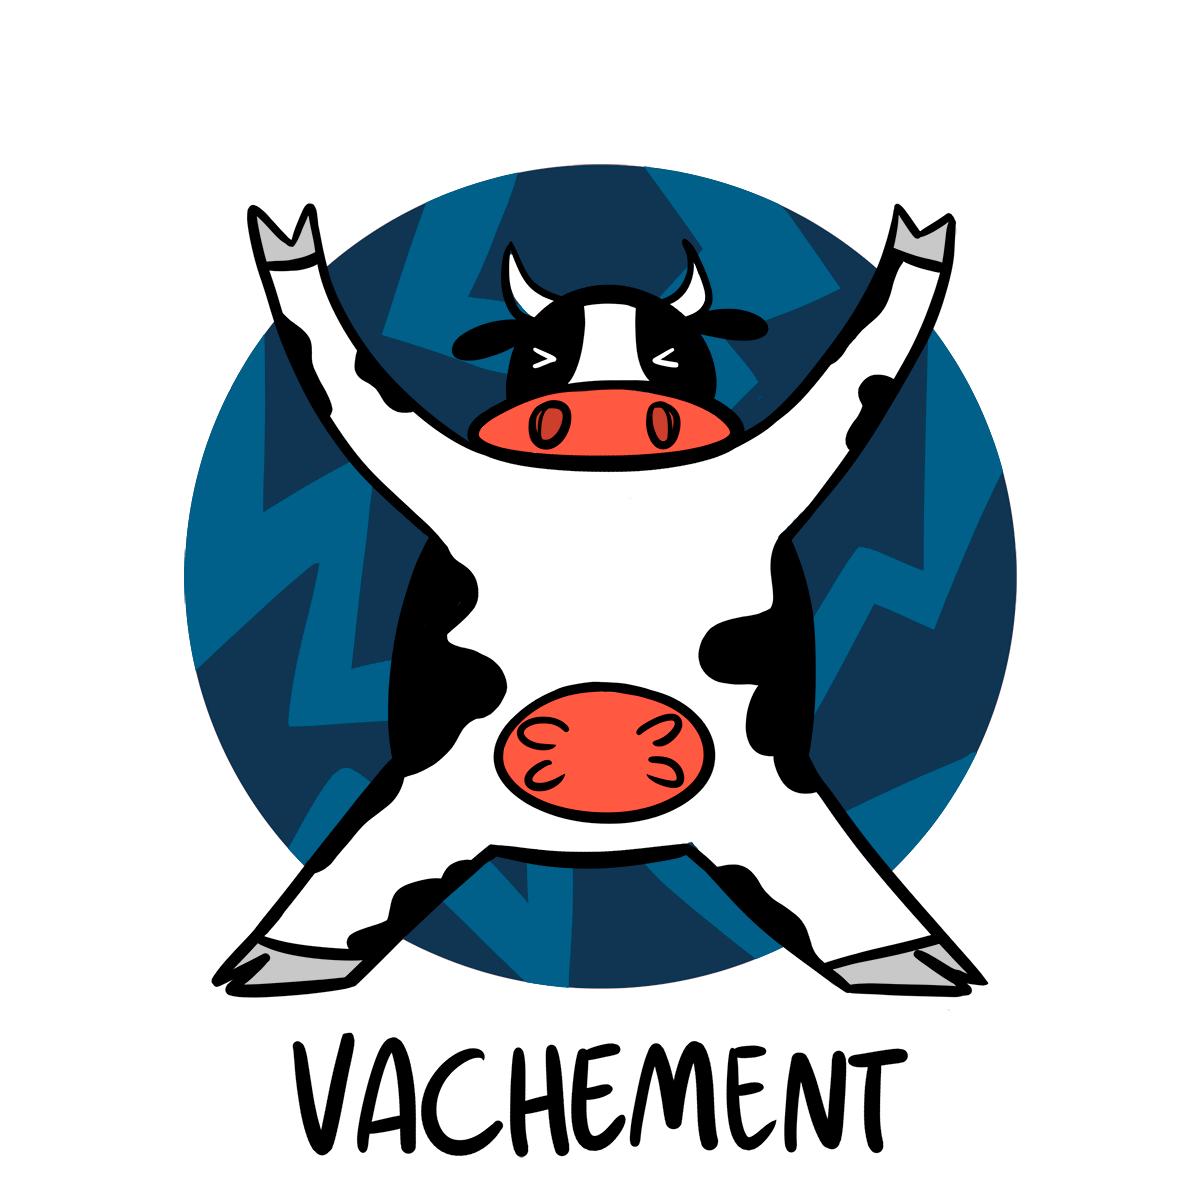 Vachement en francés